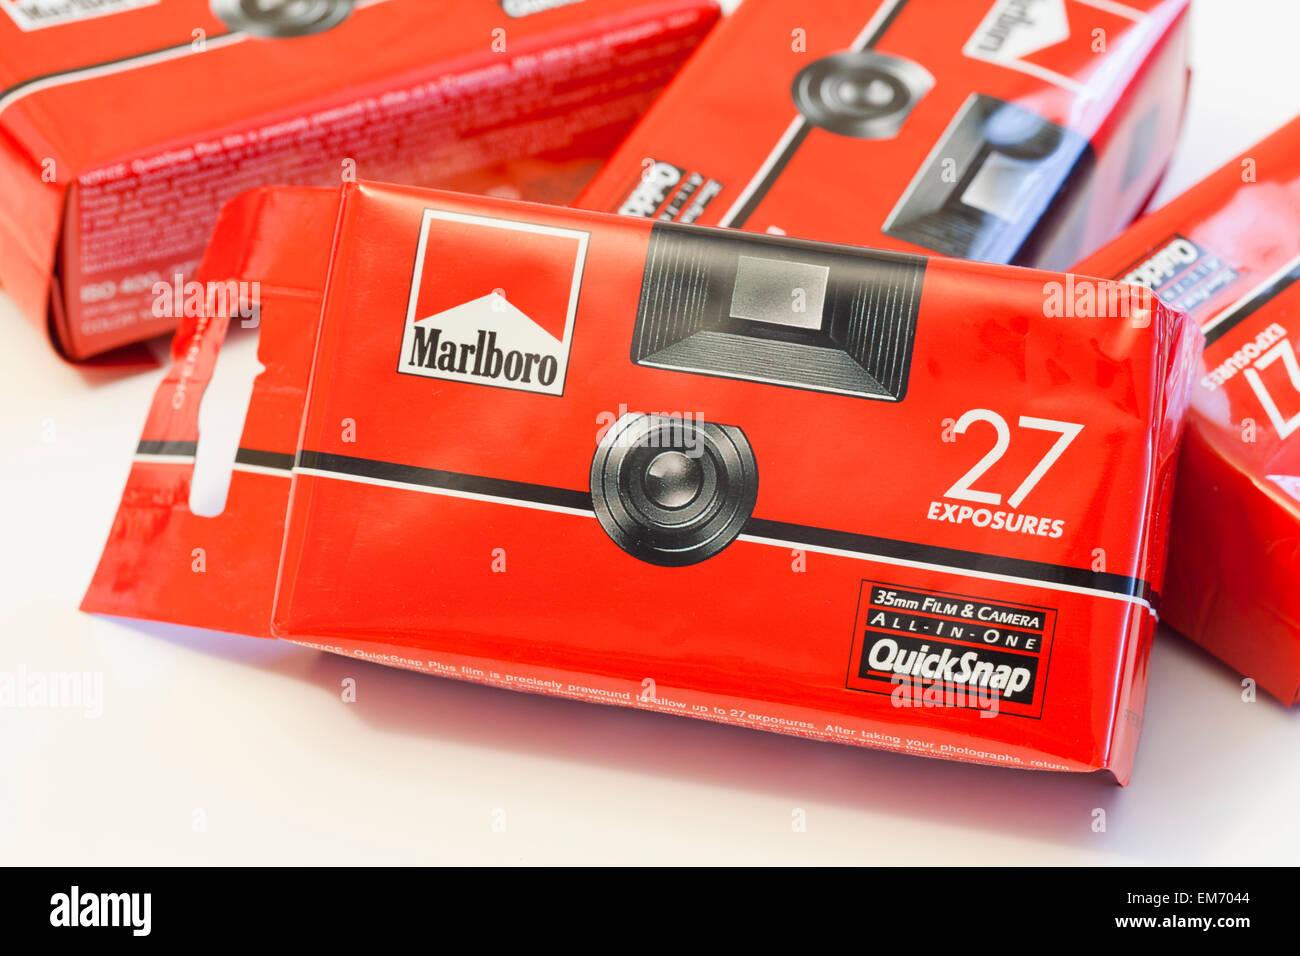 Marlboro cigarette promotional disposable camera - USA - Stock Image